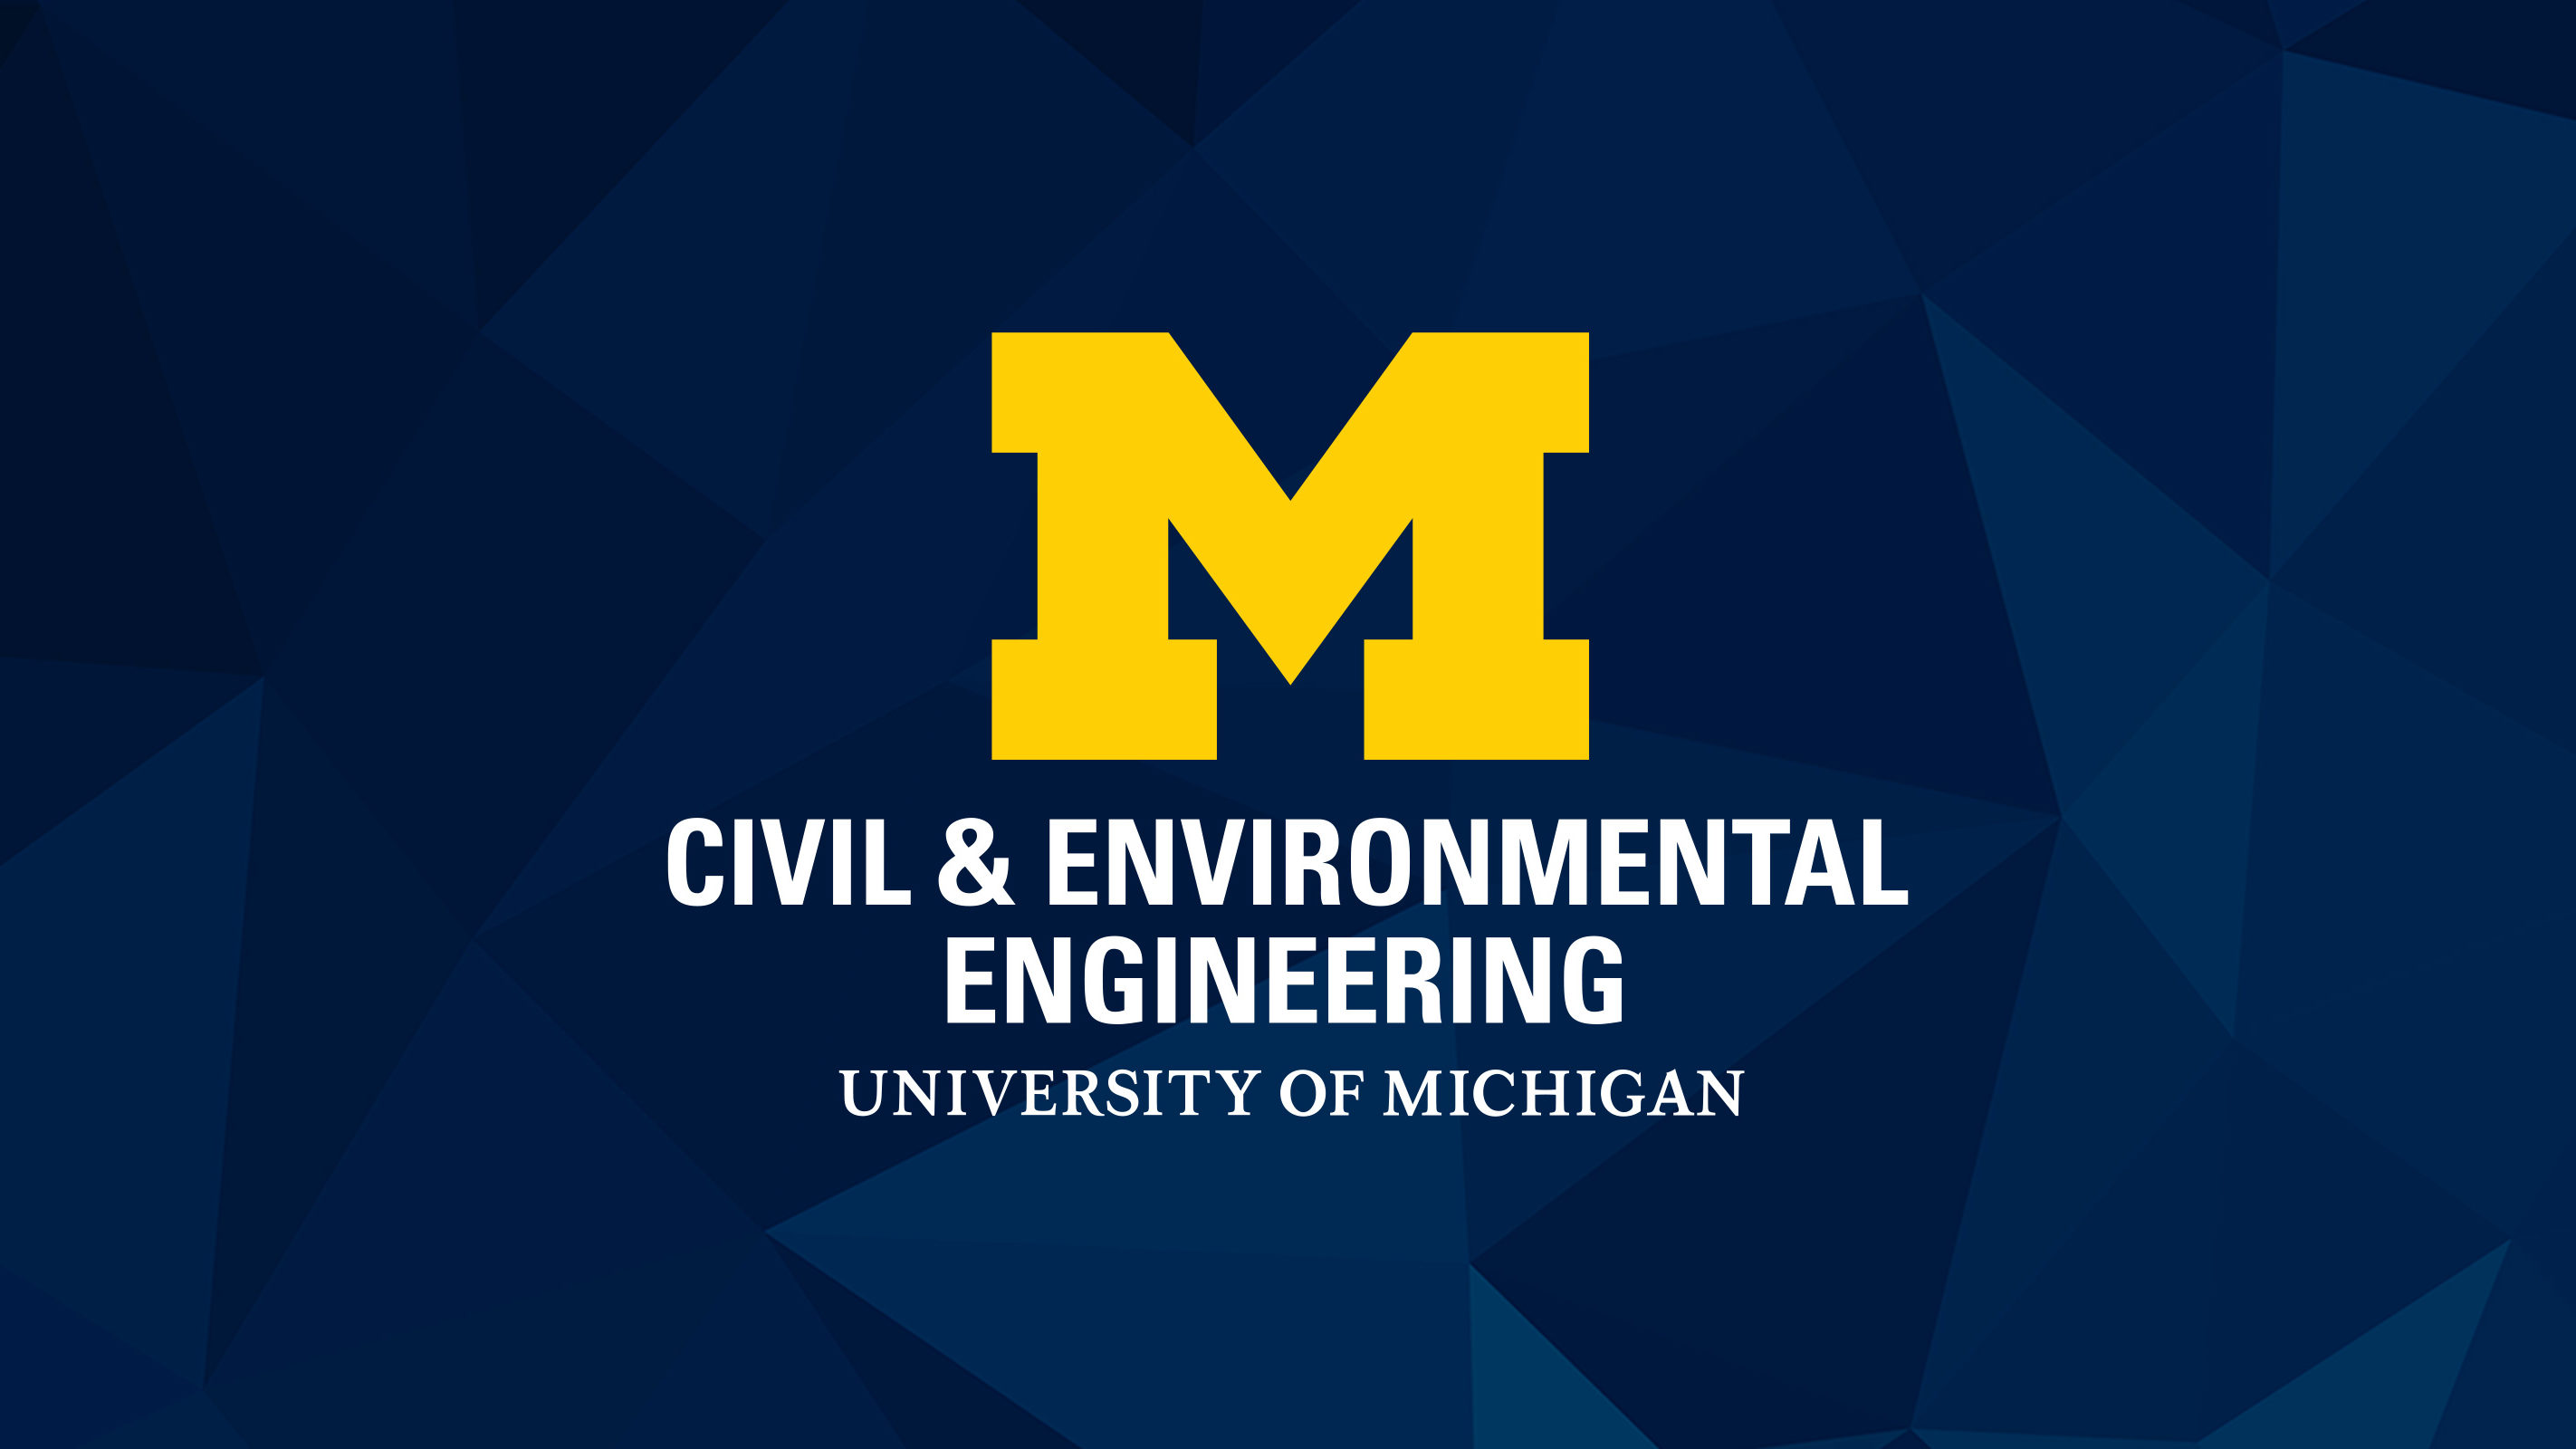 Civil & Environmental Engineering logo